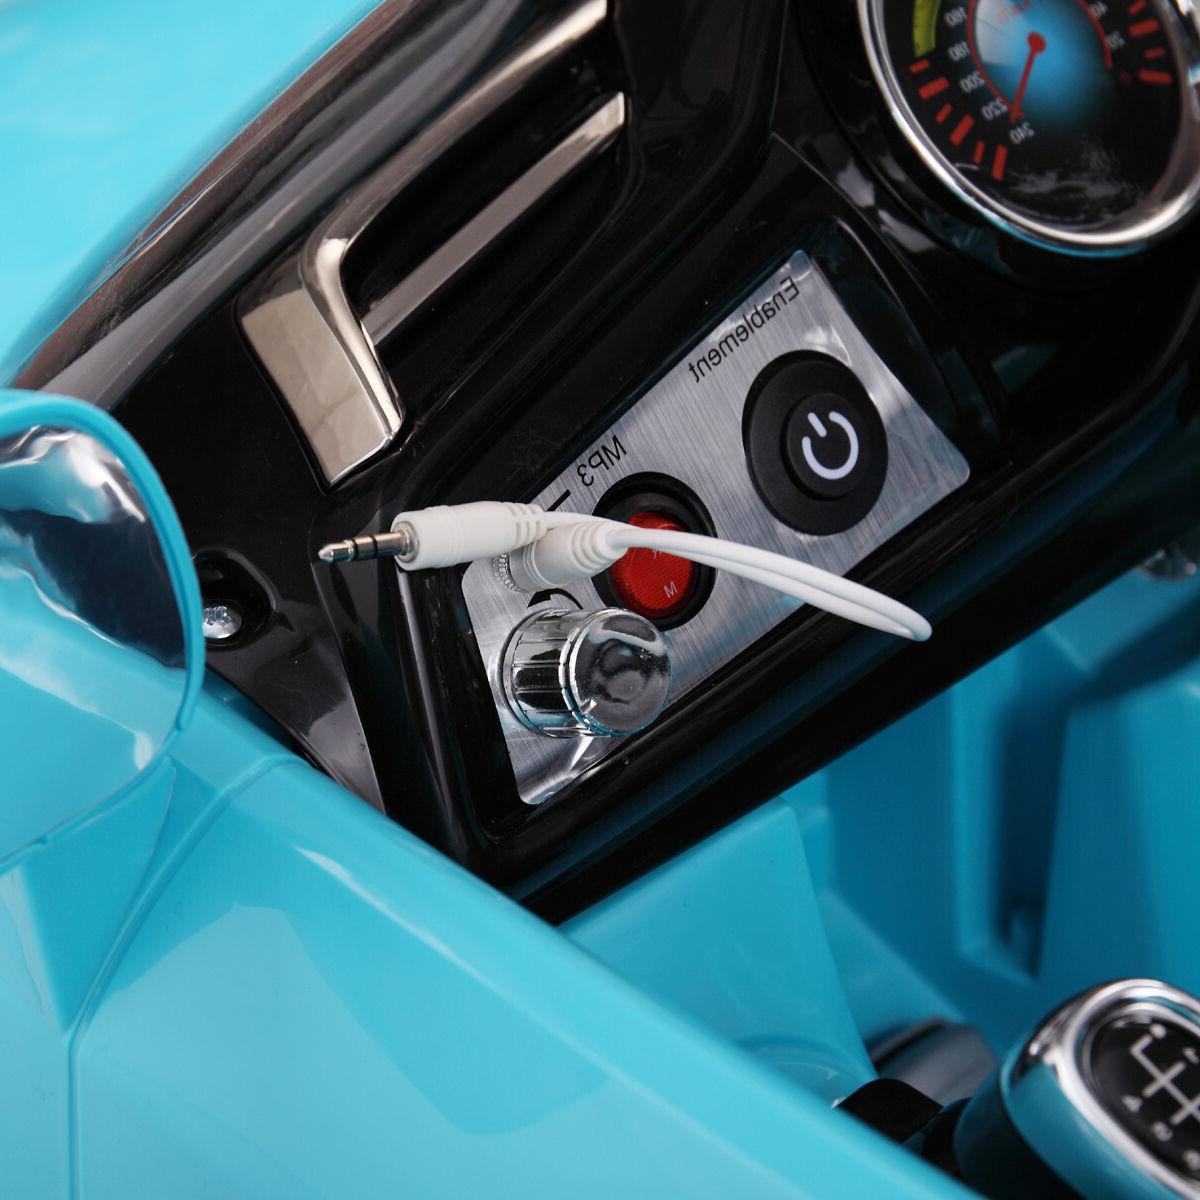 12V Ride on Kids RC Control Power W/MP3 Blue